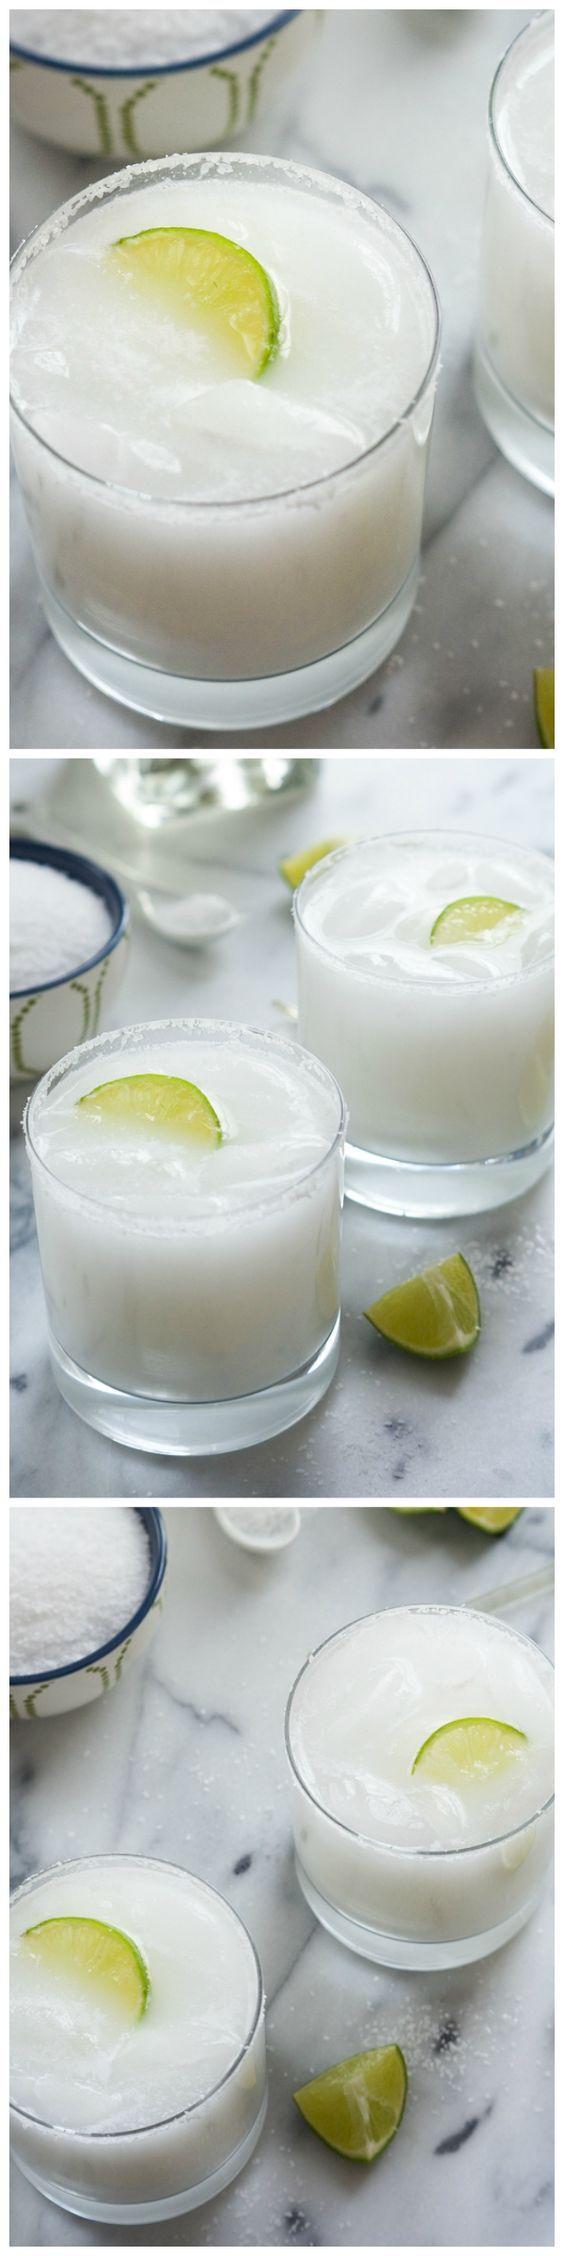 how to drink skinny girl margarita